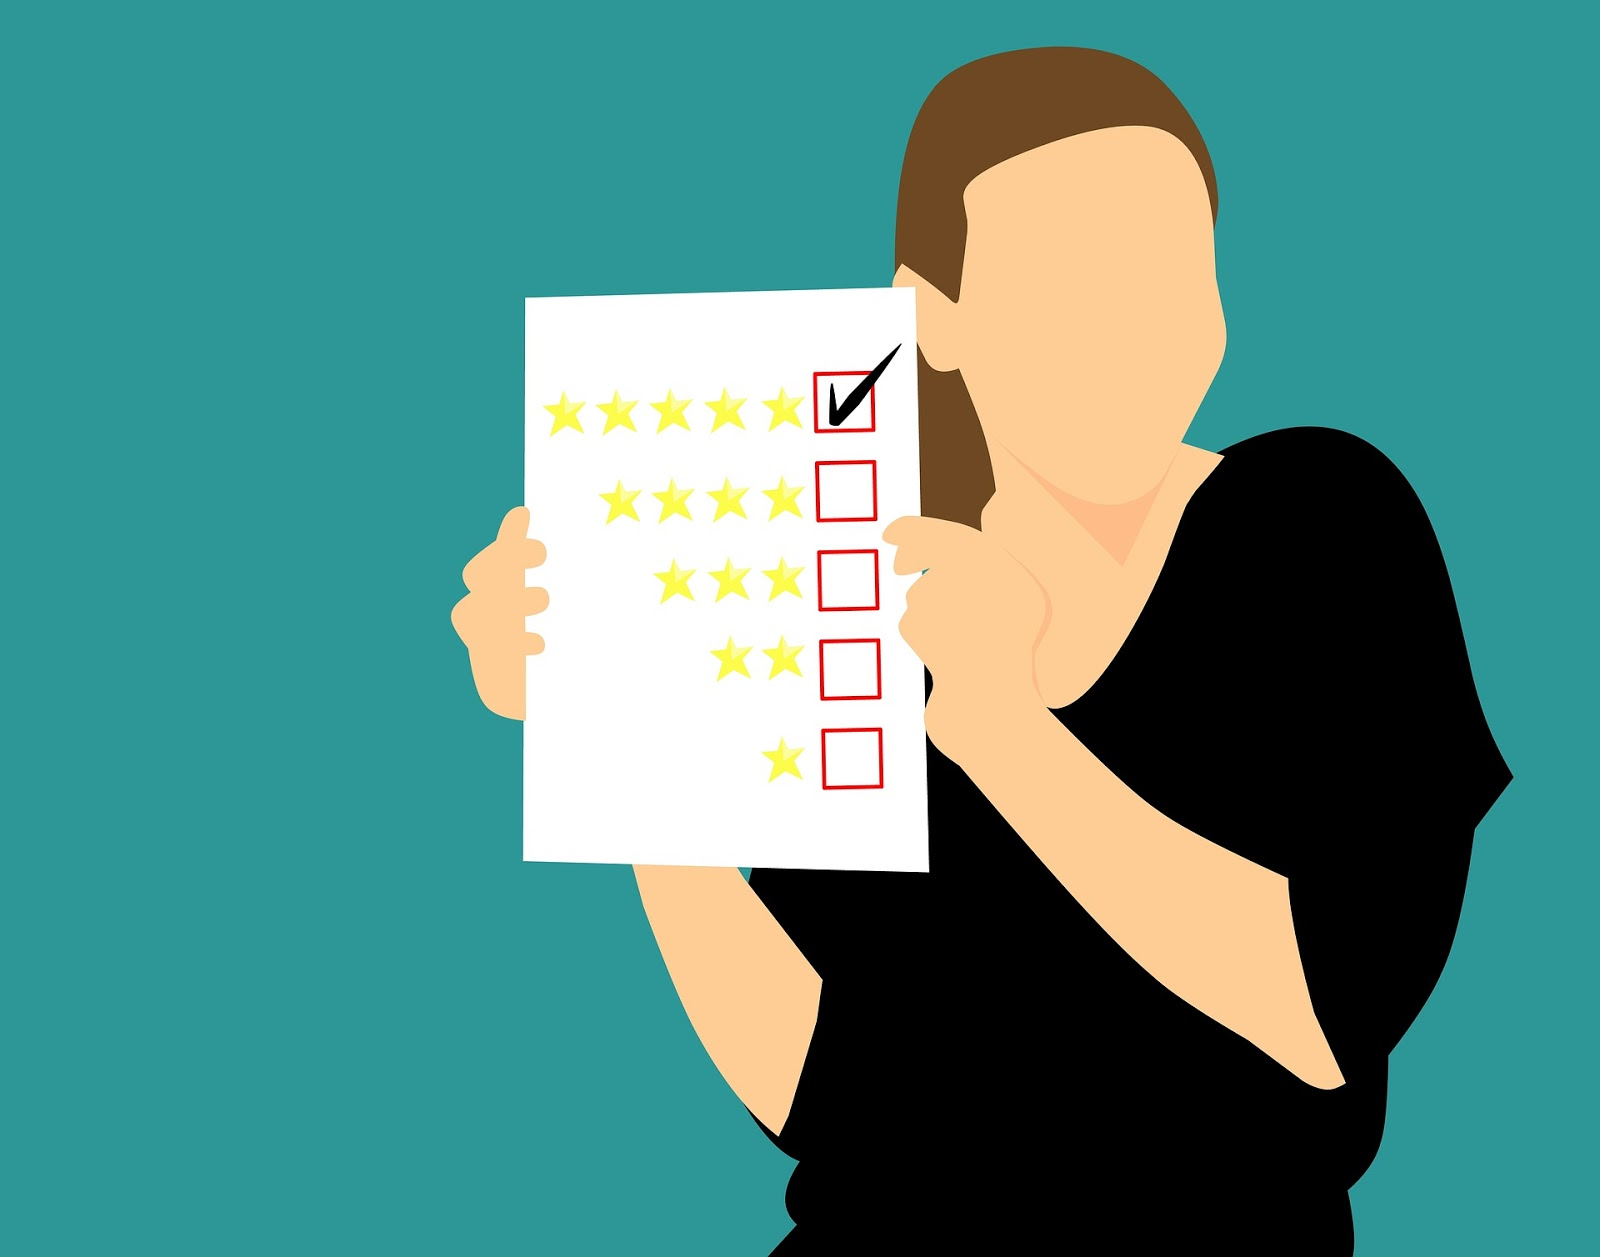 Five star customer feedback woman